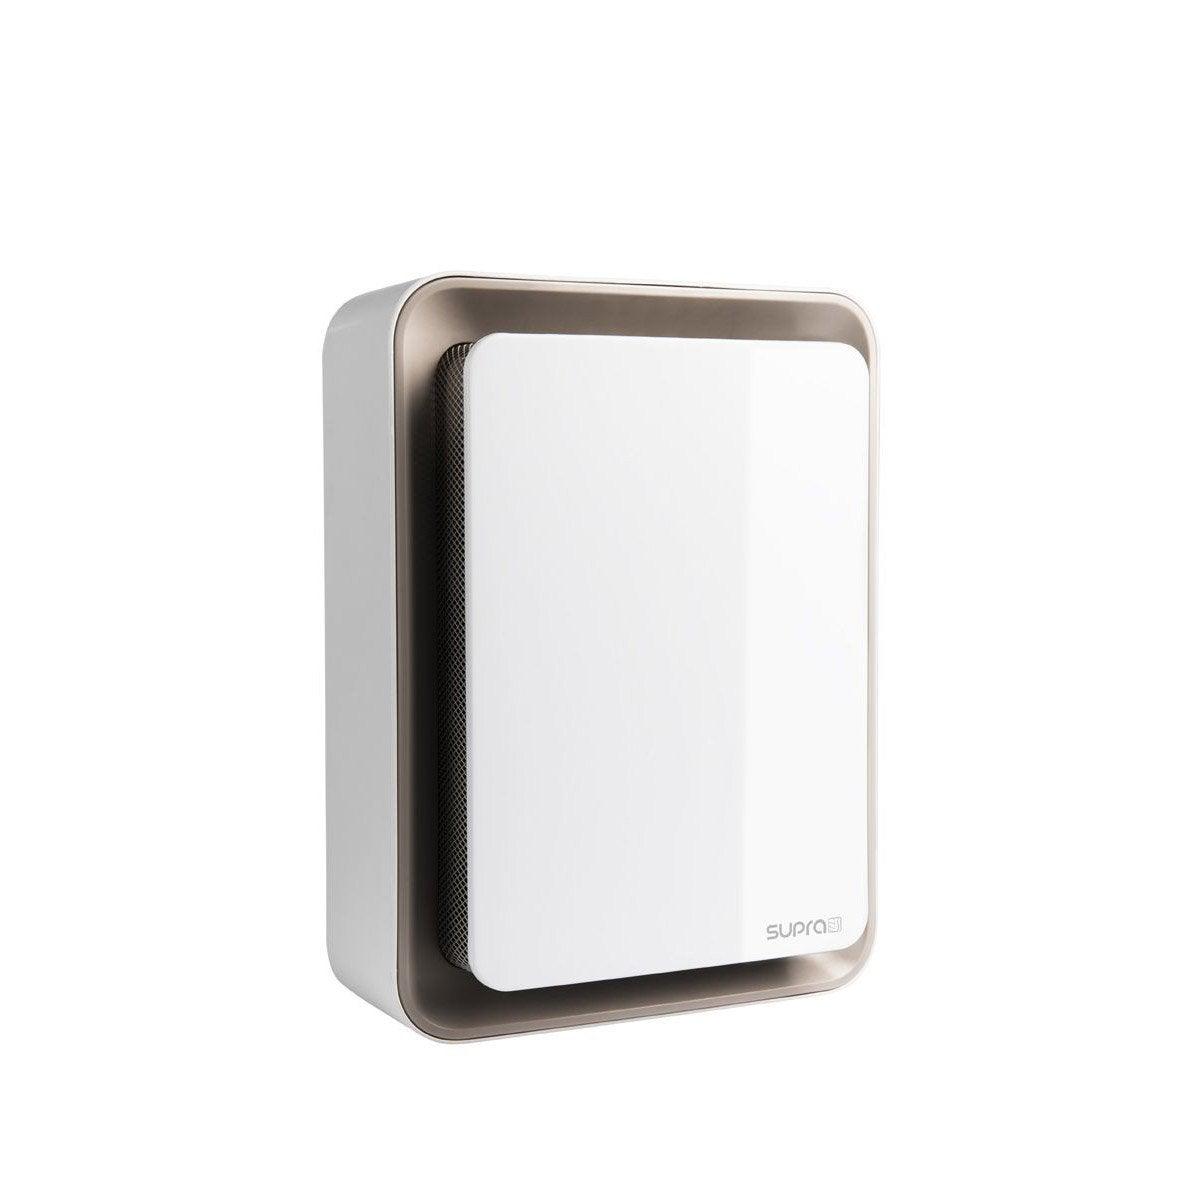 radiateur soufflant salle de bain supra zitto taupe 1800w. Black Bedroom Furniture Sets. Home Design Ideas